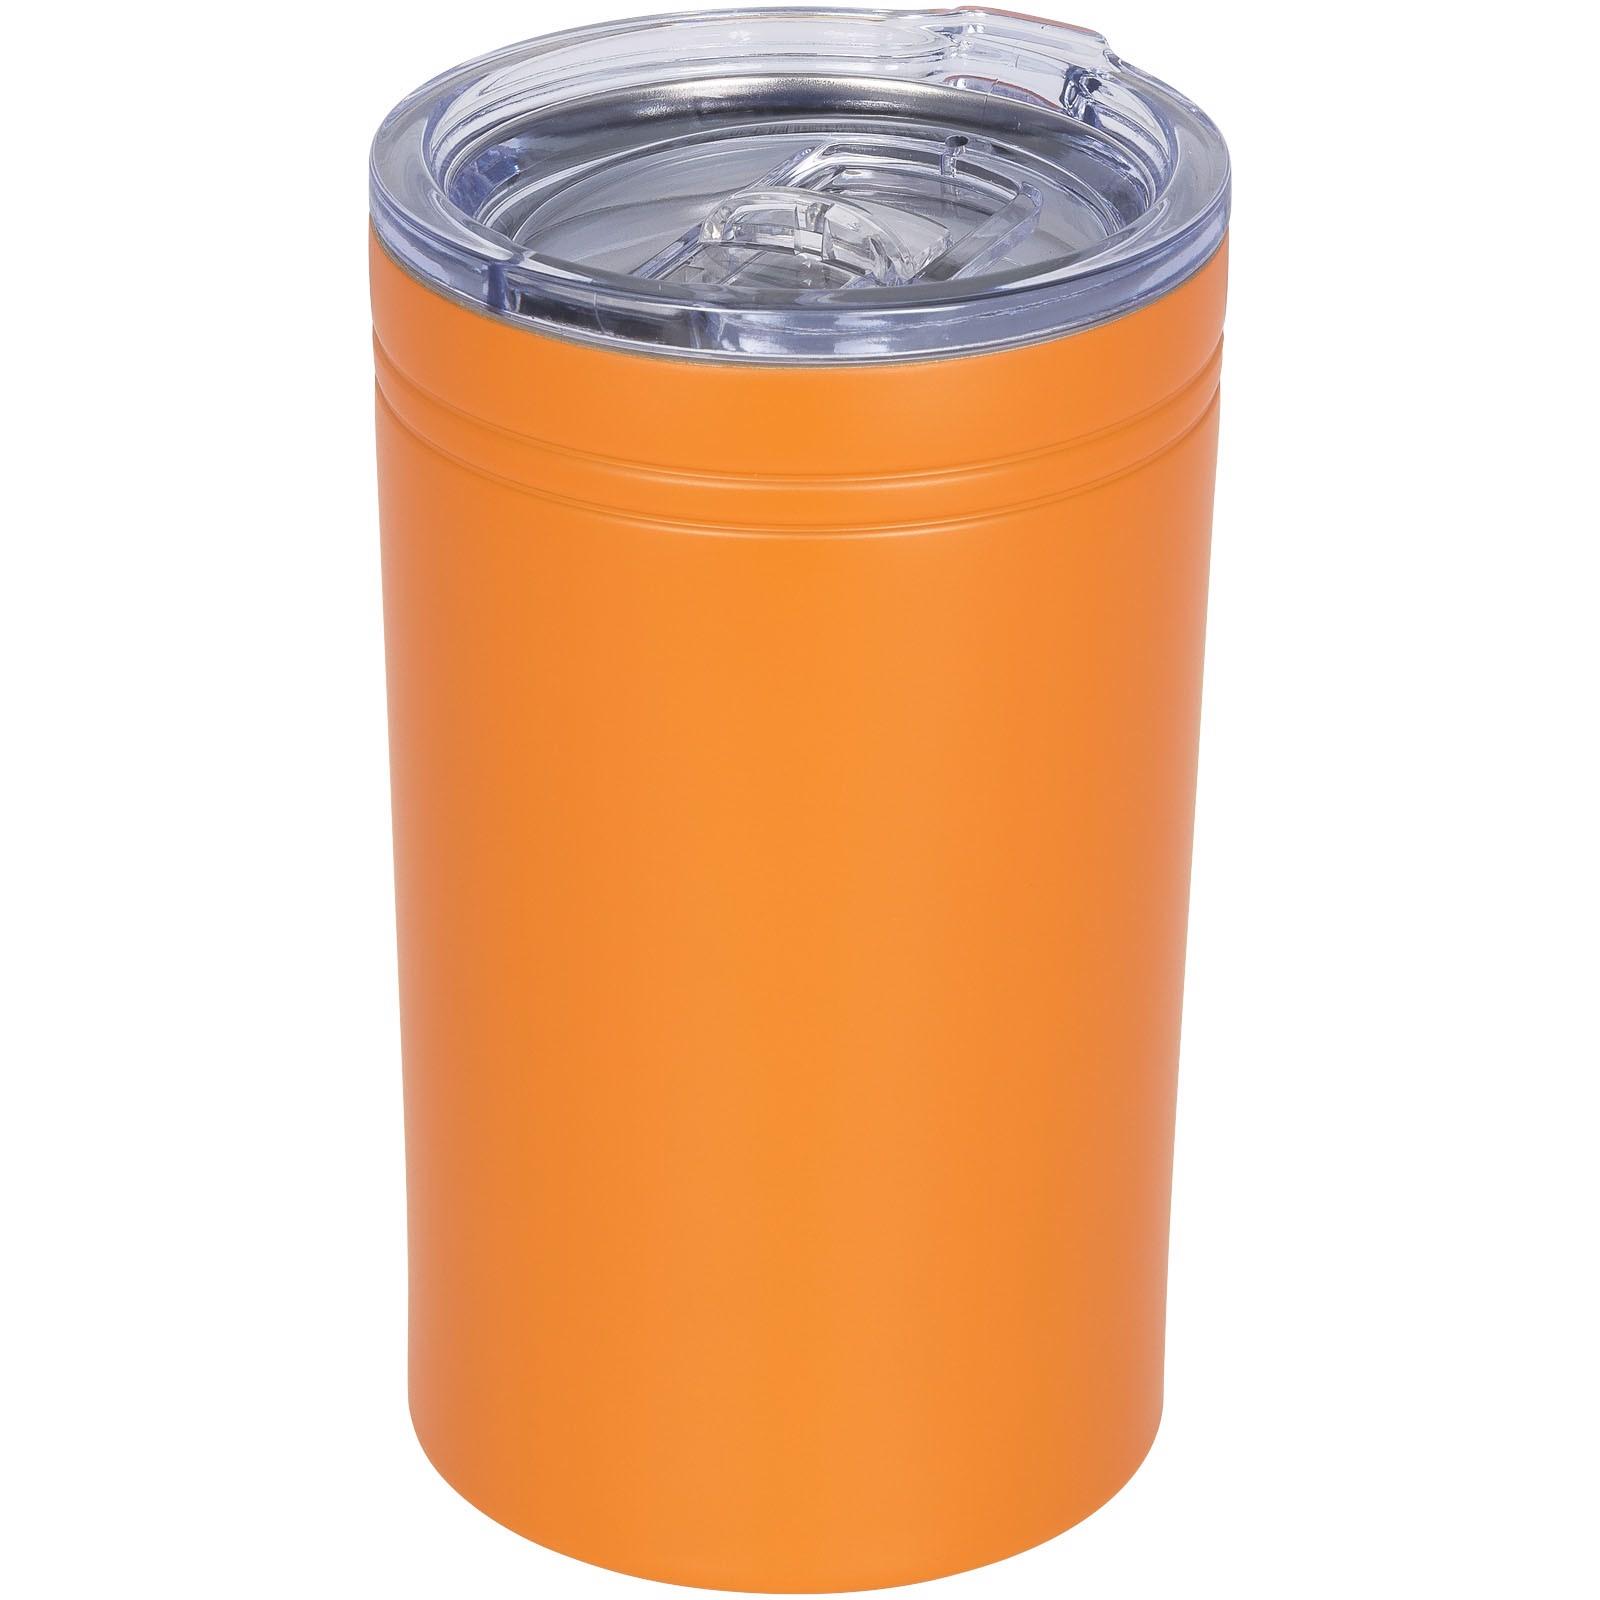 Termohrnek a termoska Pika 330 ml s vakuovou izolací - 0ranžová